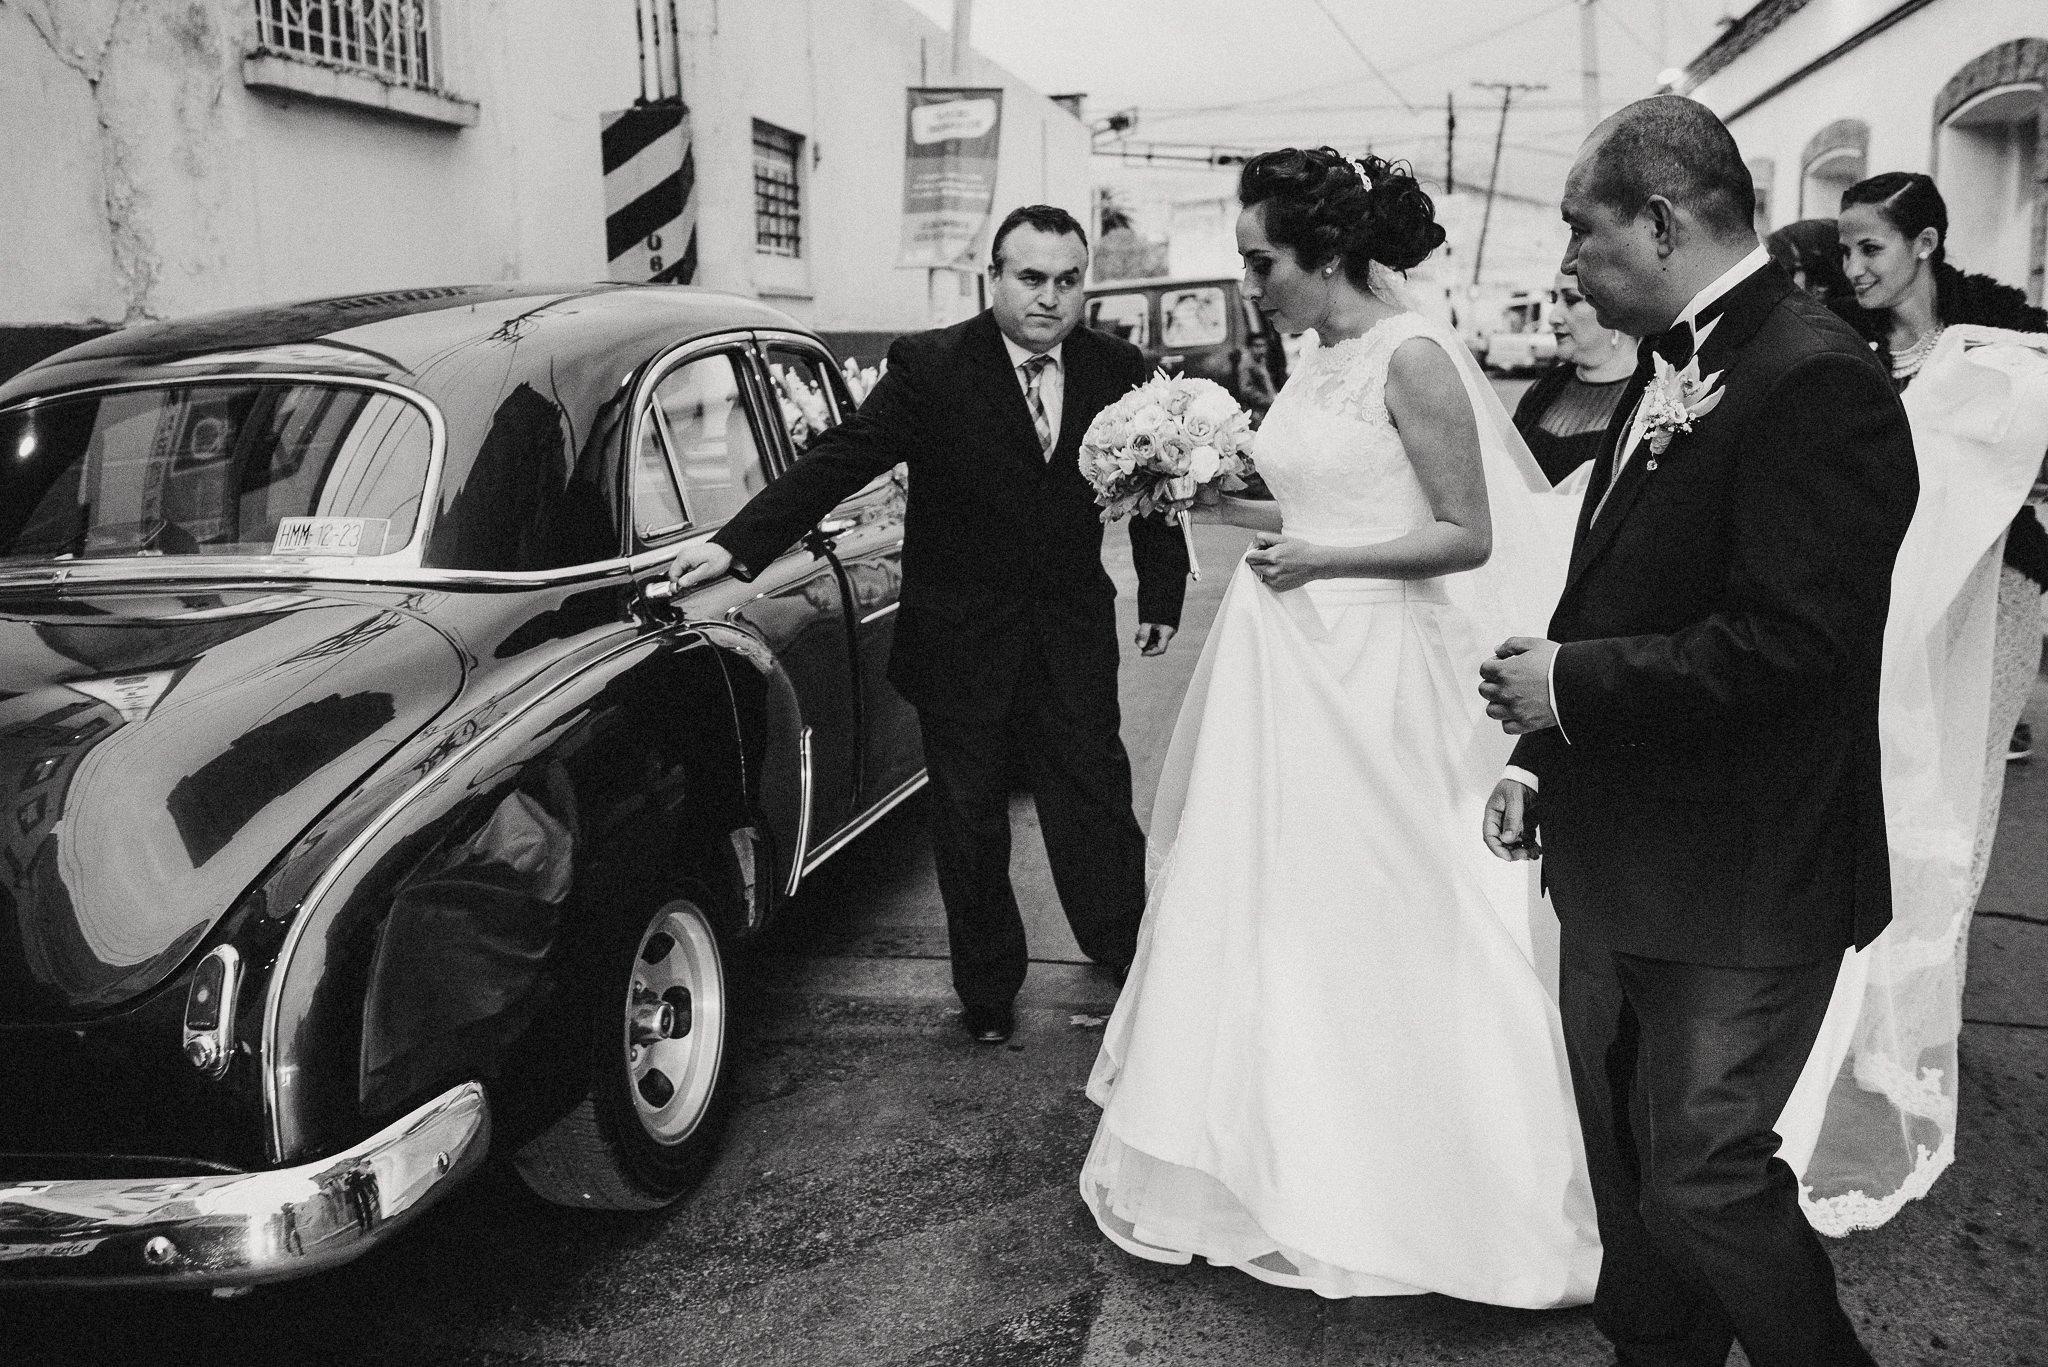 Wedding-Boda-Tulancingo-Hidalgo-Salon-Essenzia-Luis-Houdin-35-film